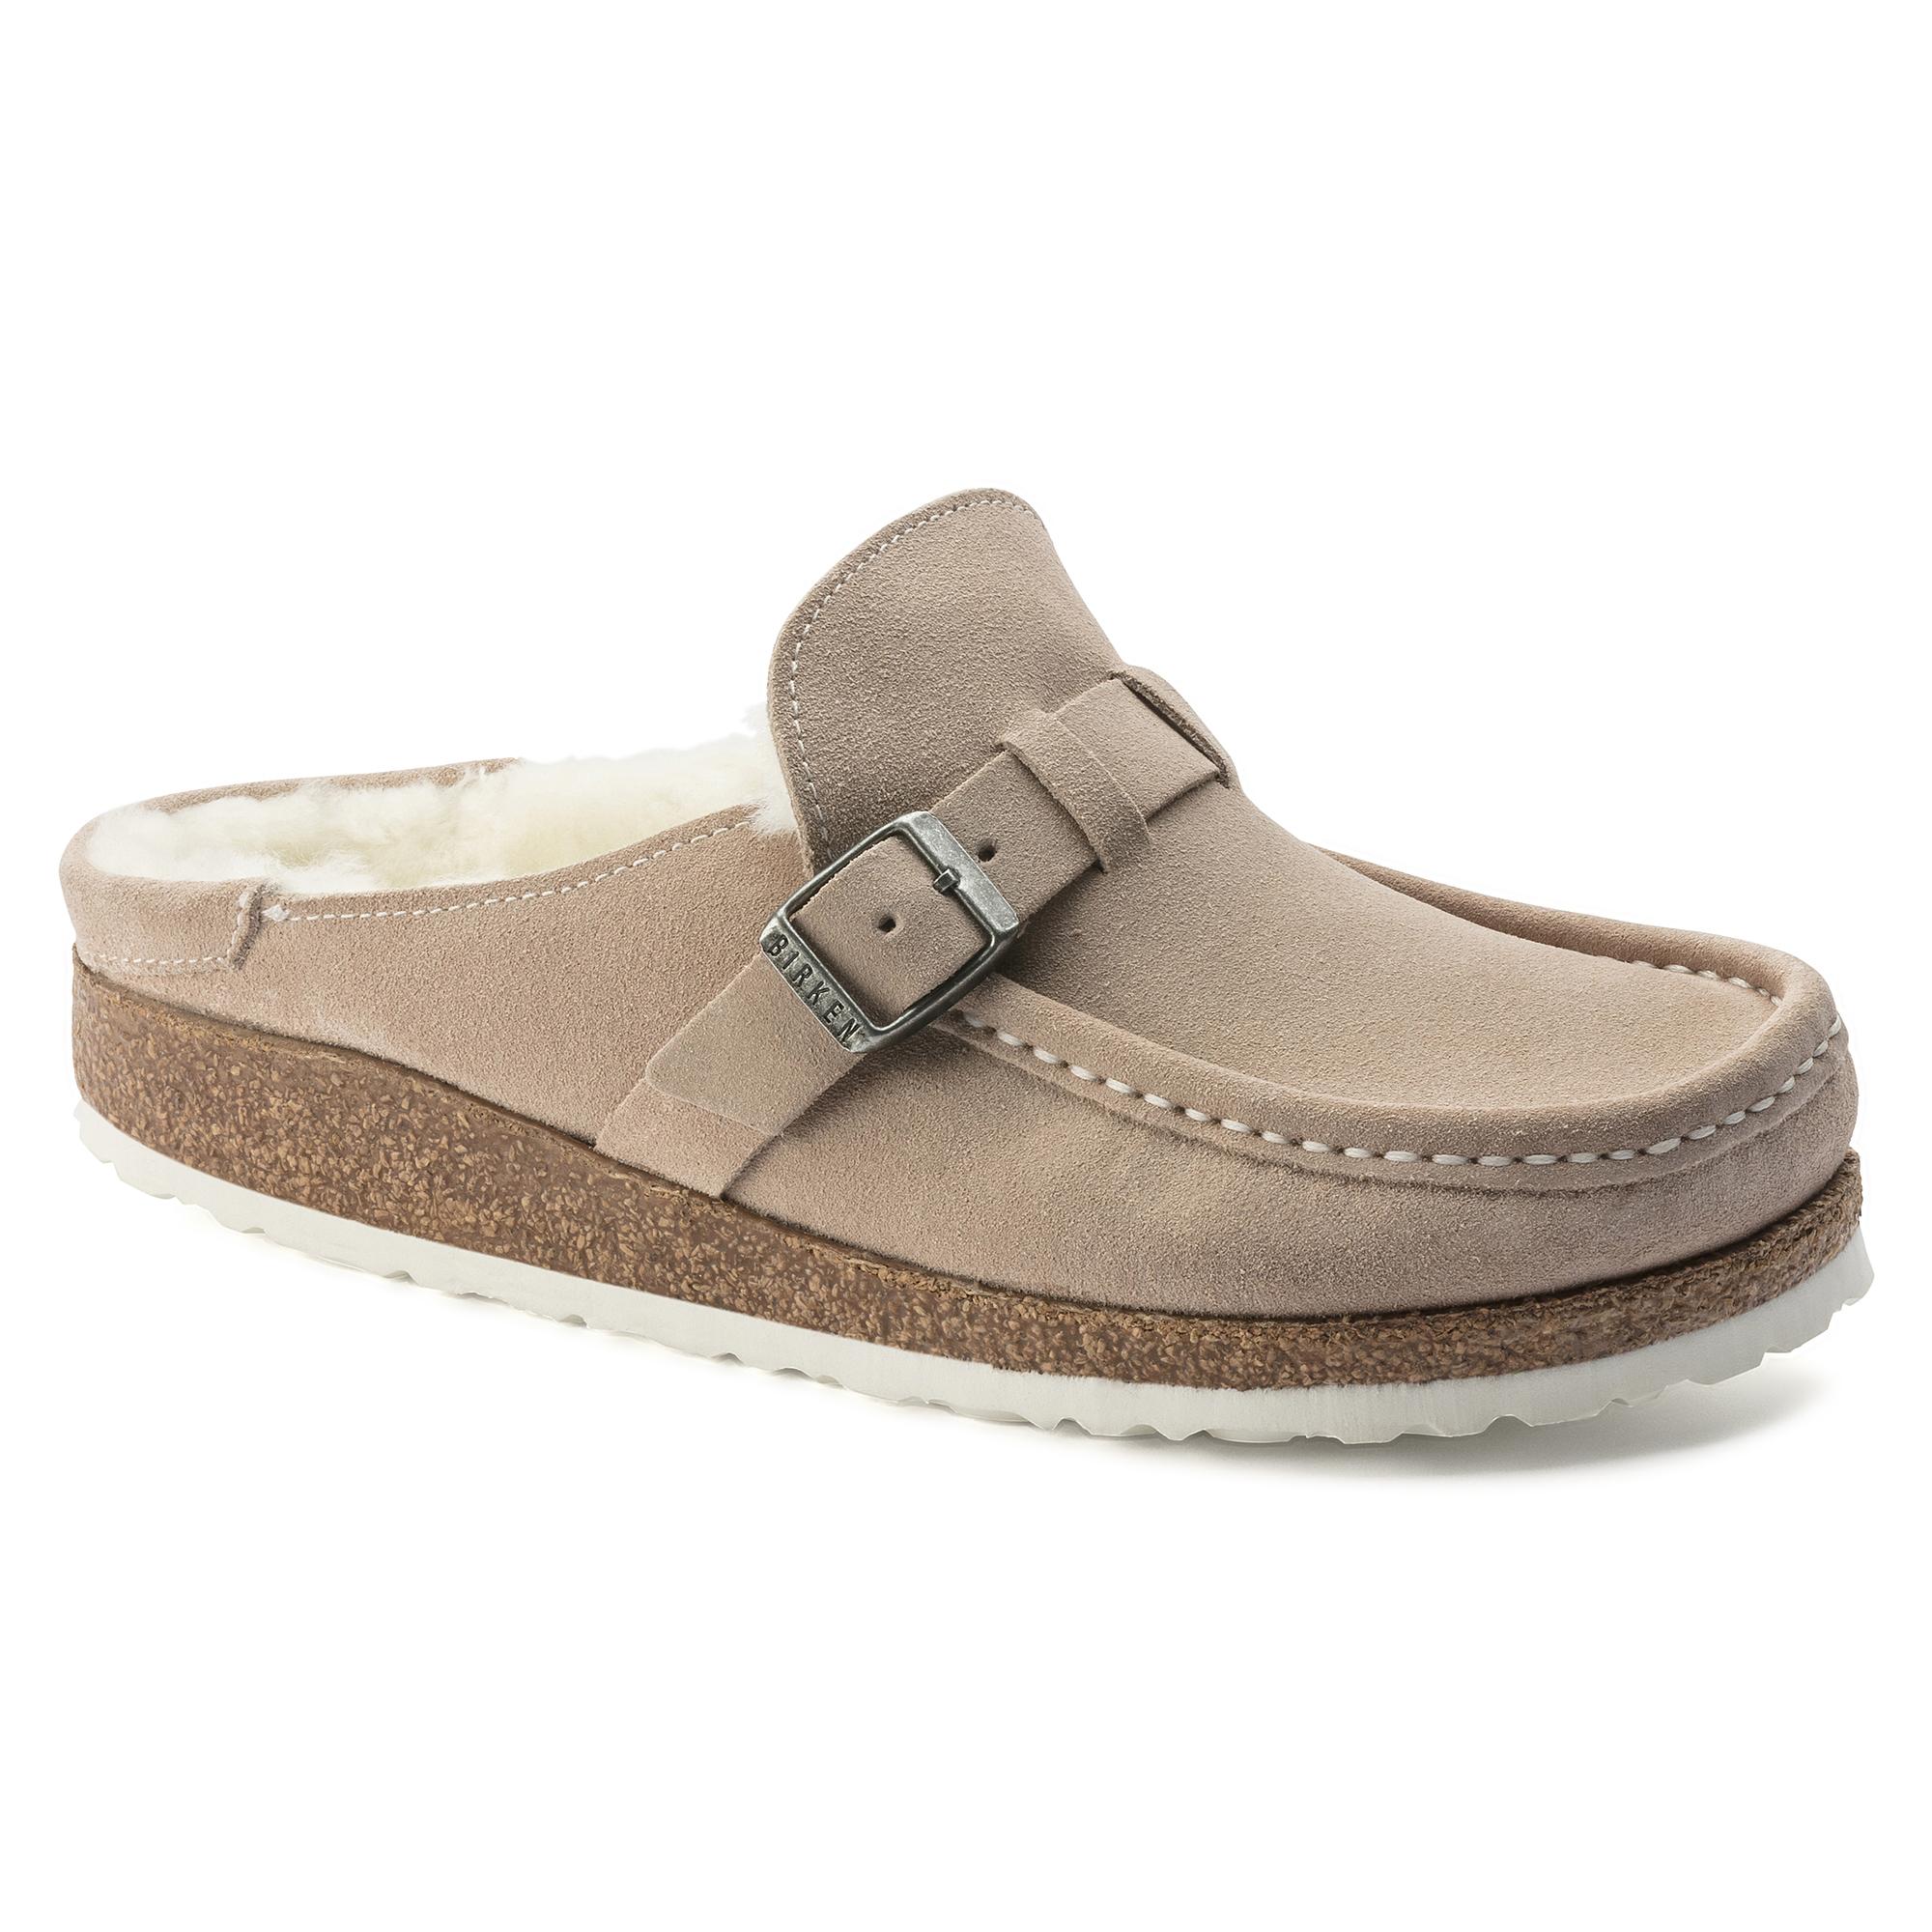 Birkenstock Arizona Suede Nude Narrow - Womens Footwear